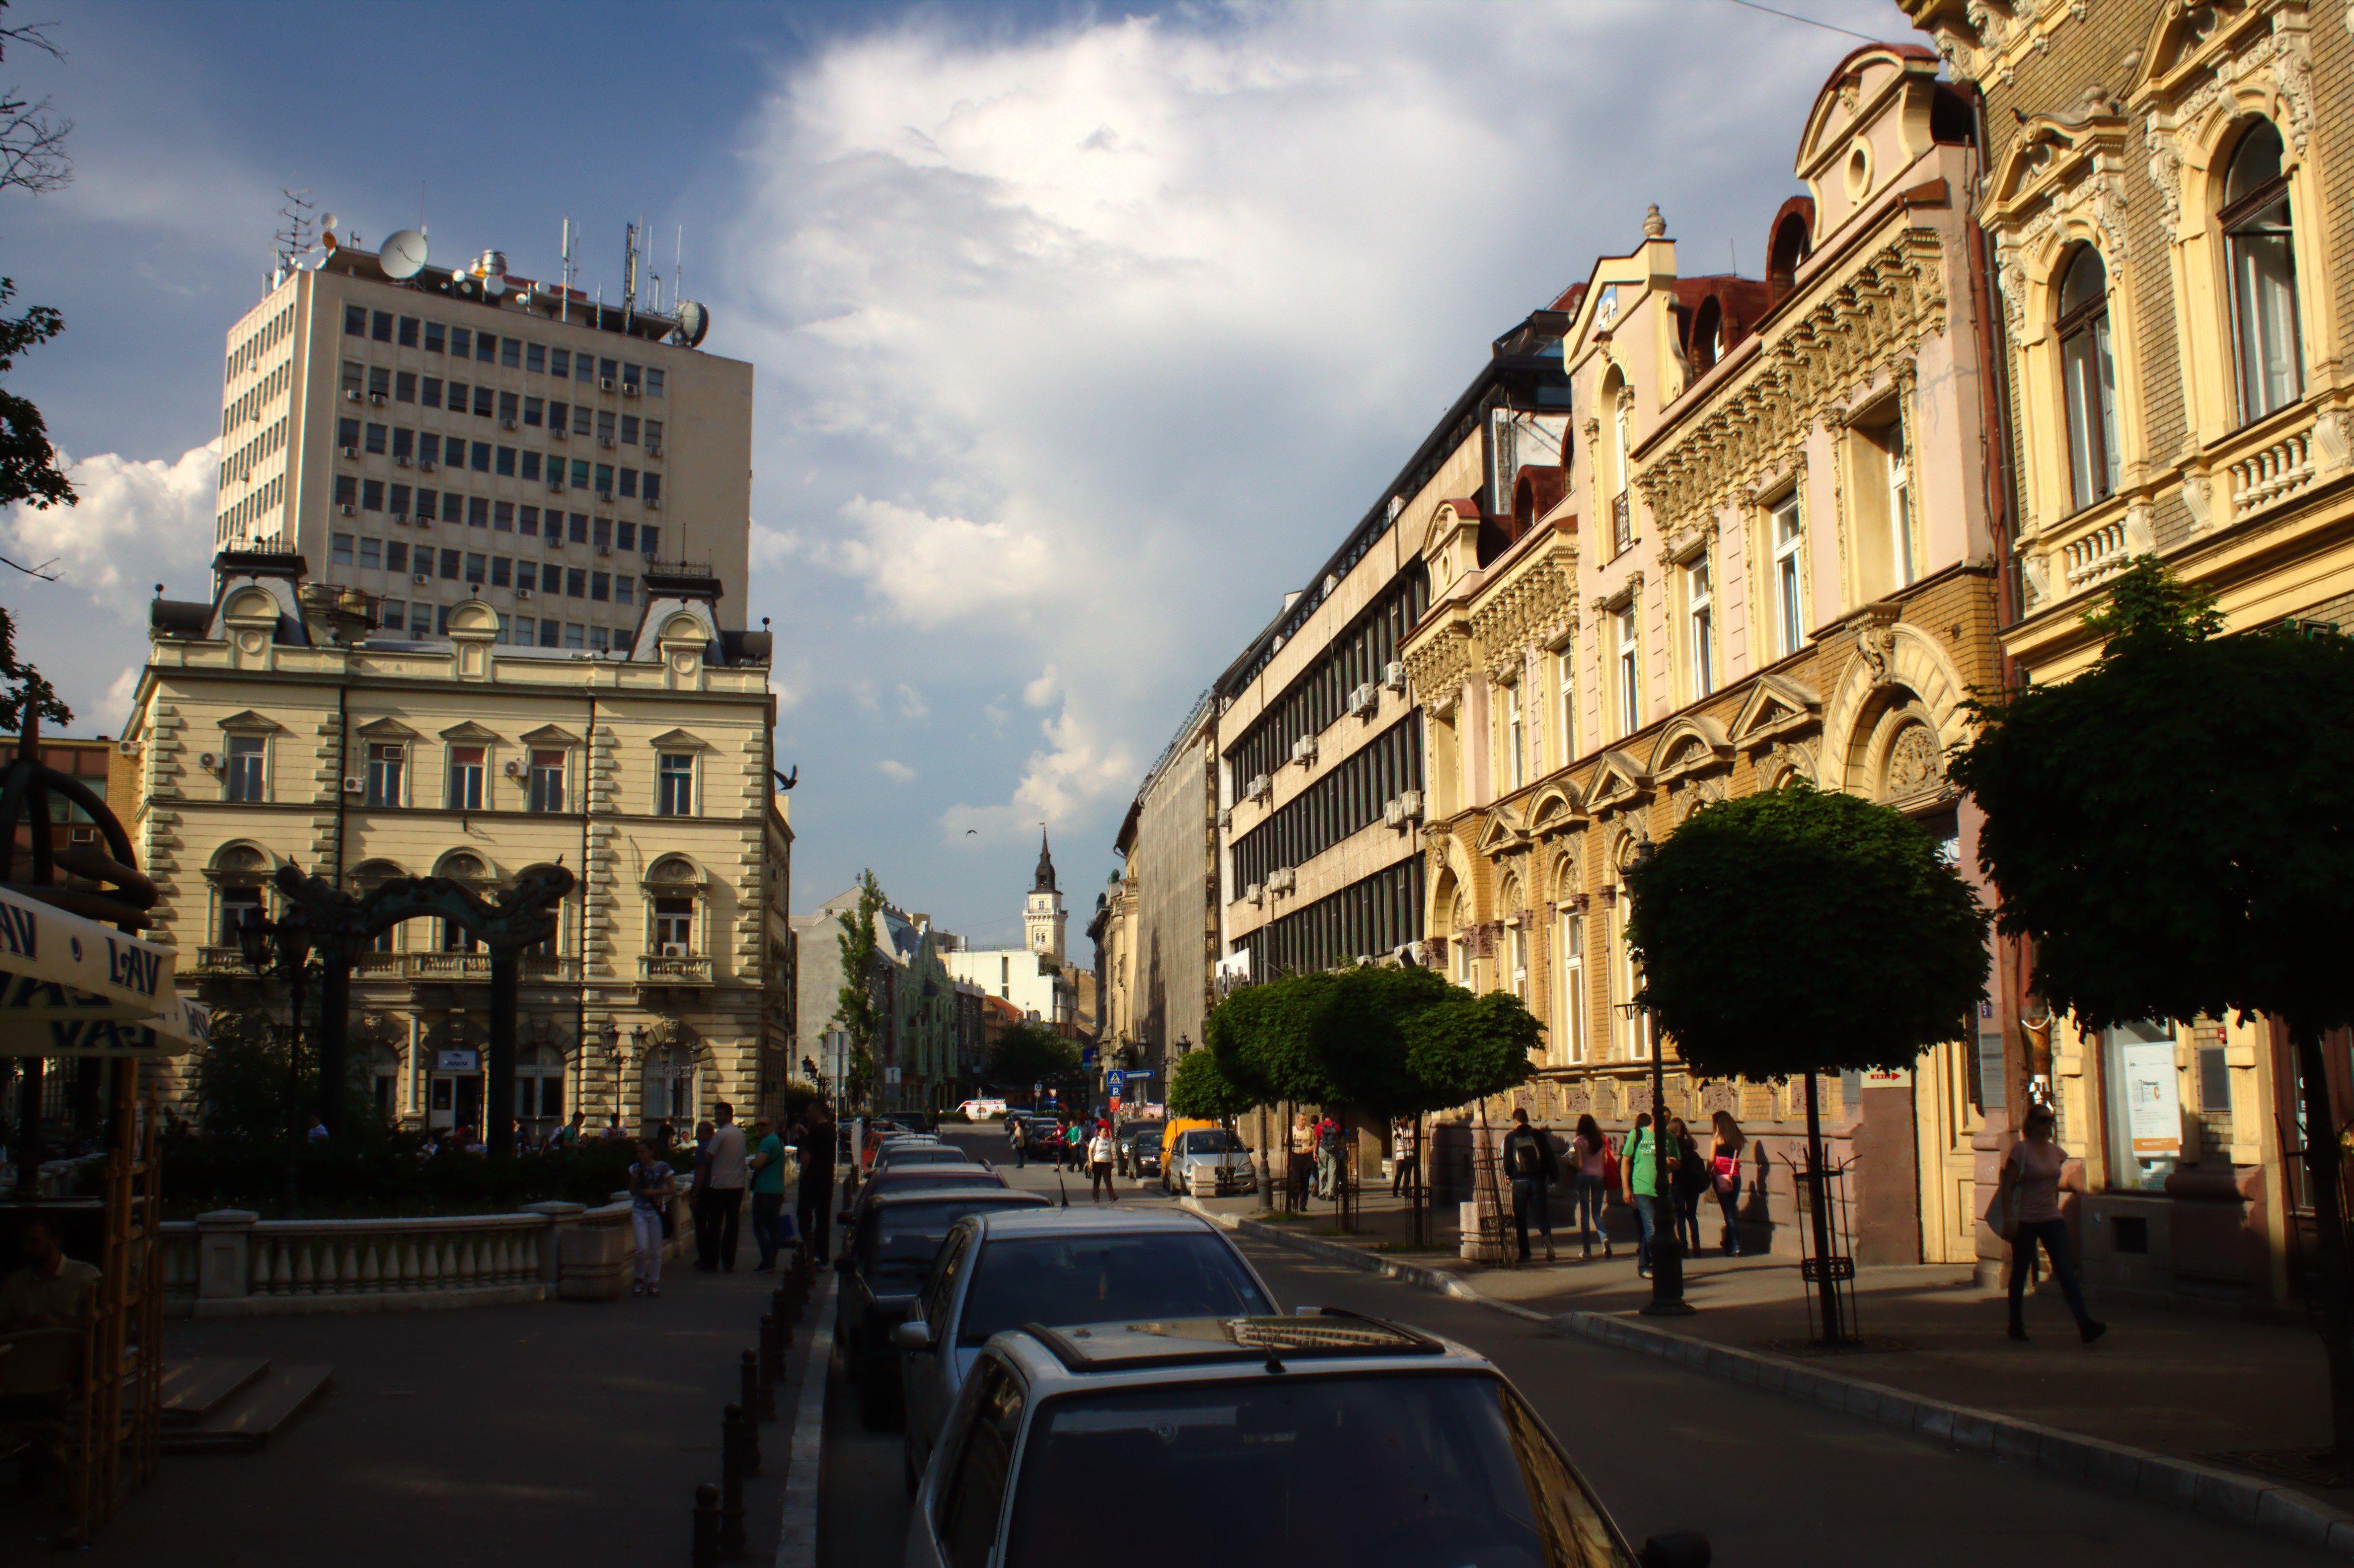 Zeleznicka street, Novi Sad, Serbia